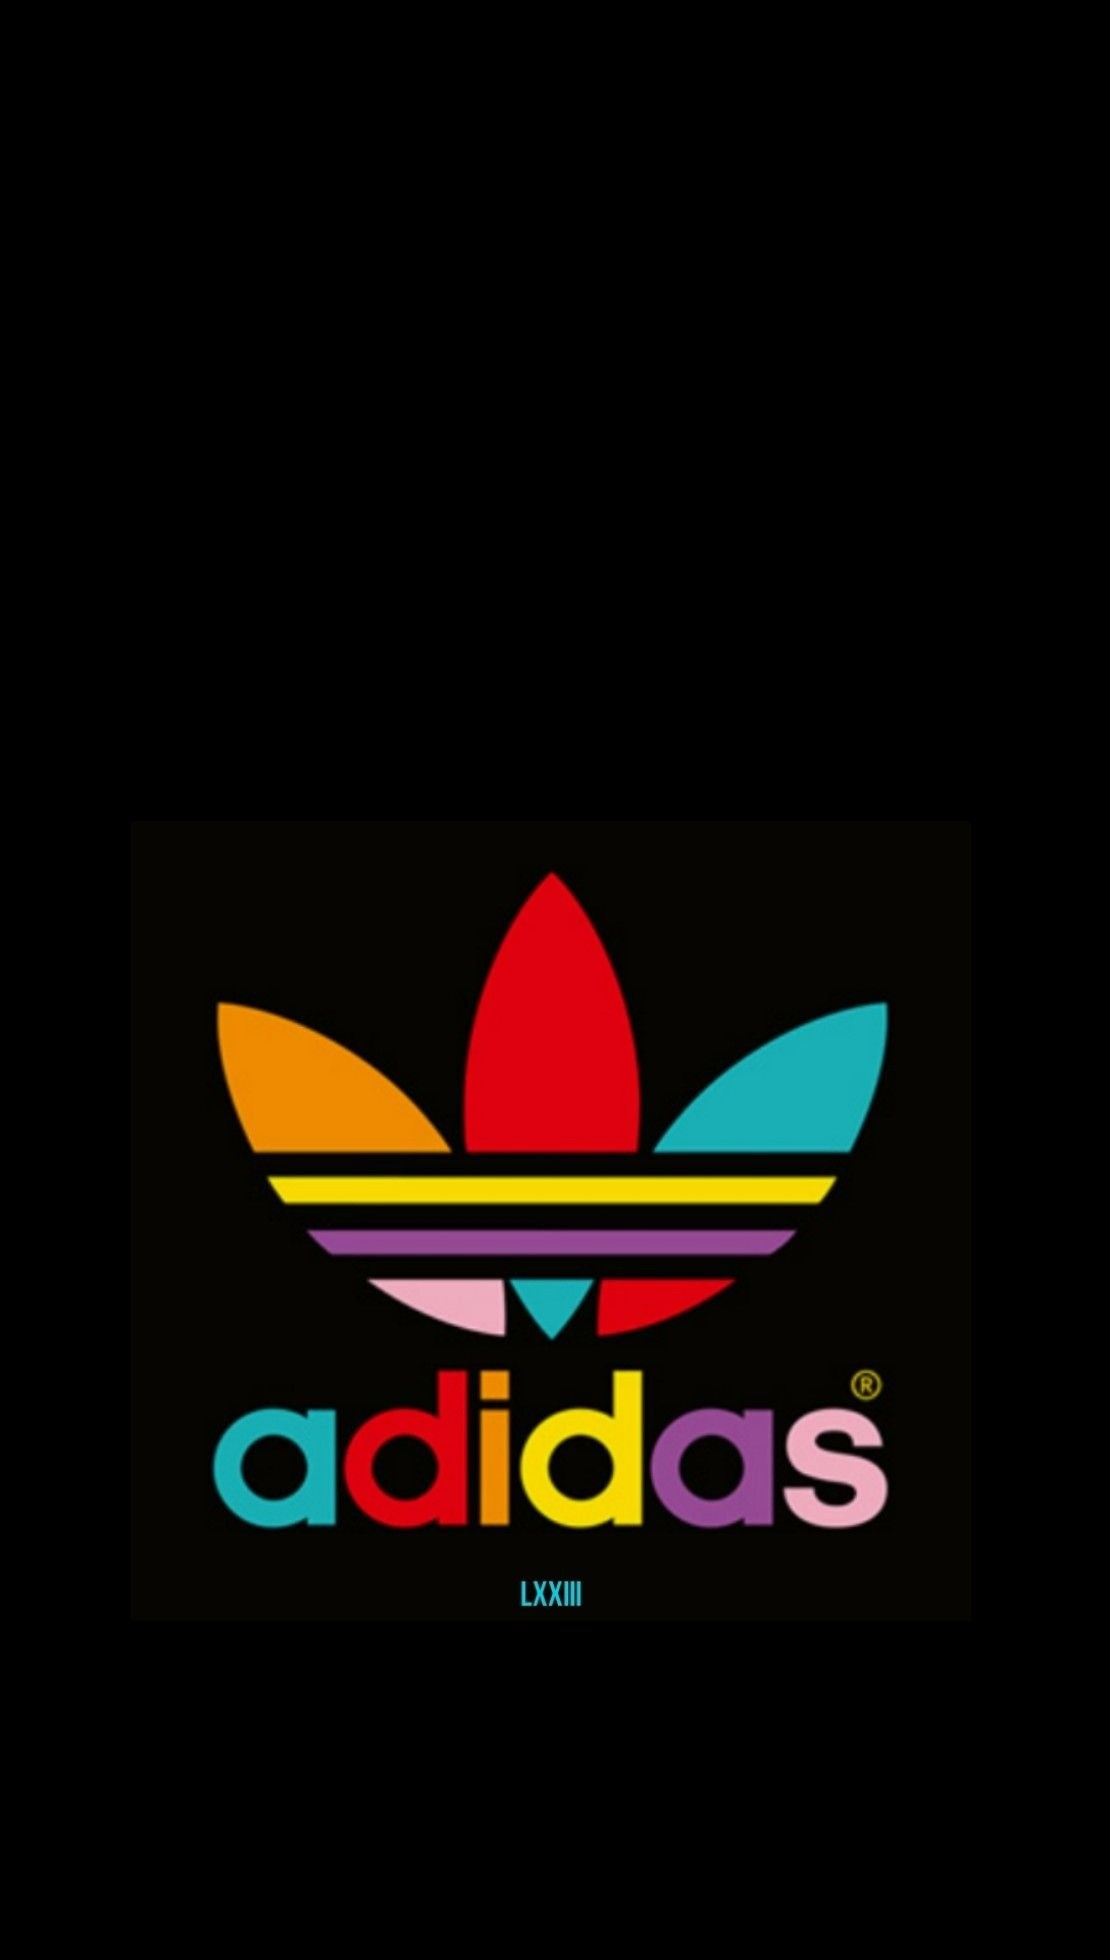 Res: 1110x1960, Colorful Adidas on Black Wallpaper Black Wallpaper Wallpaper Backgrounds  Iphone Wallpaper Arte Legal